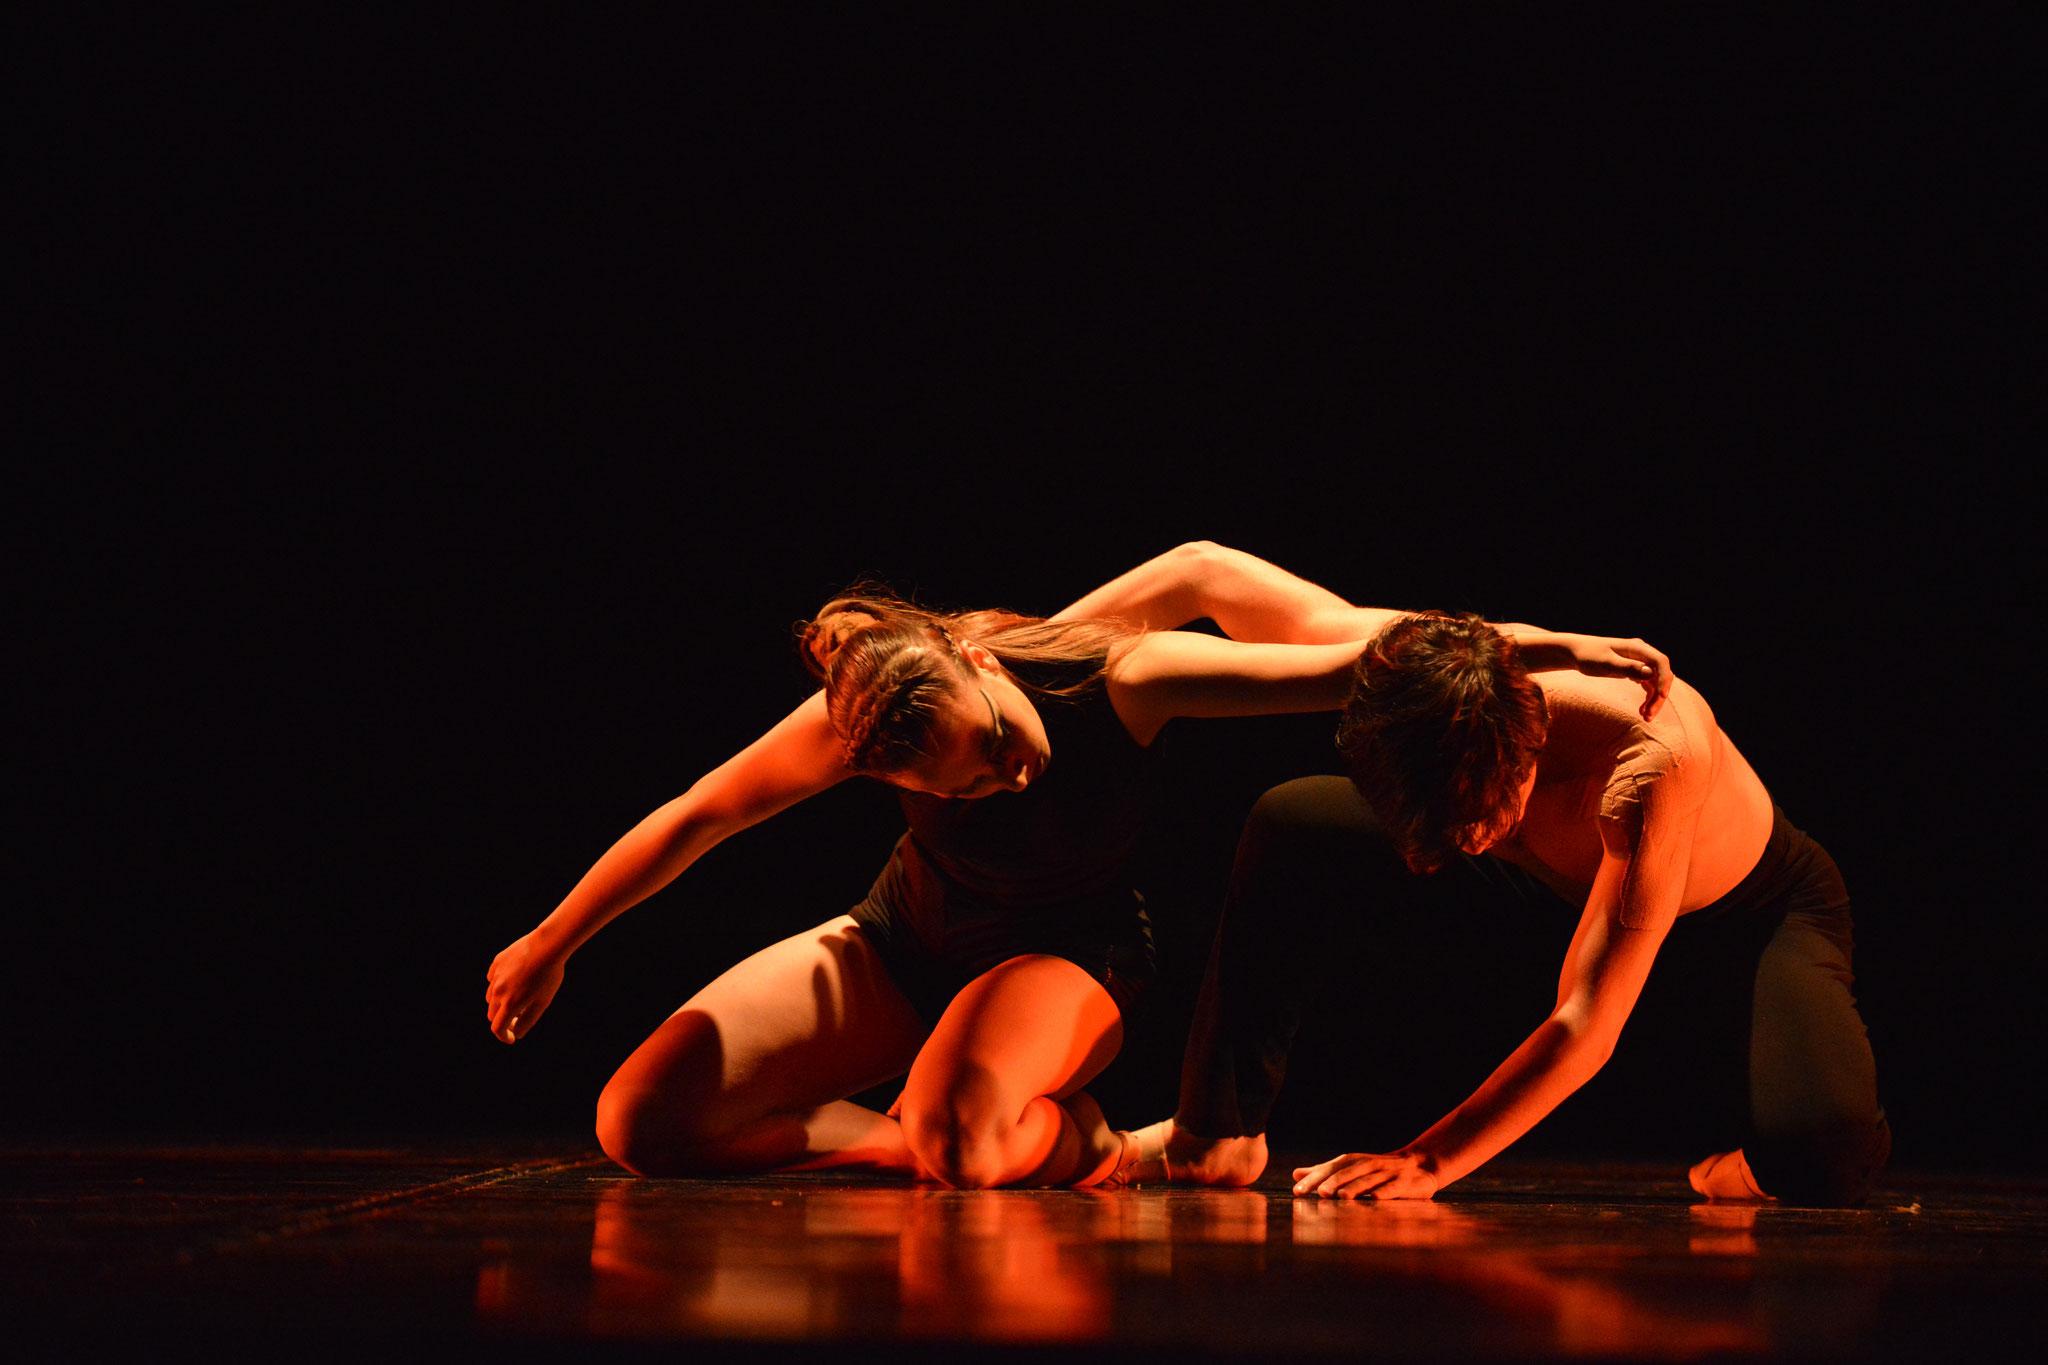 Mo-Mo /Brasil 2108 Bento-em-Danca; 2° Lugar / Intérpretes Clara Ossandon(17); Benjamín Trejo(17)